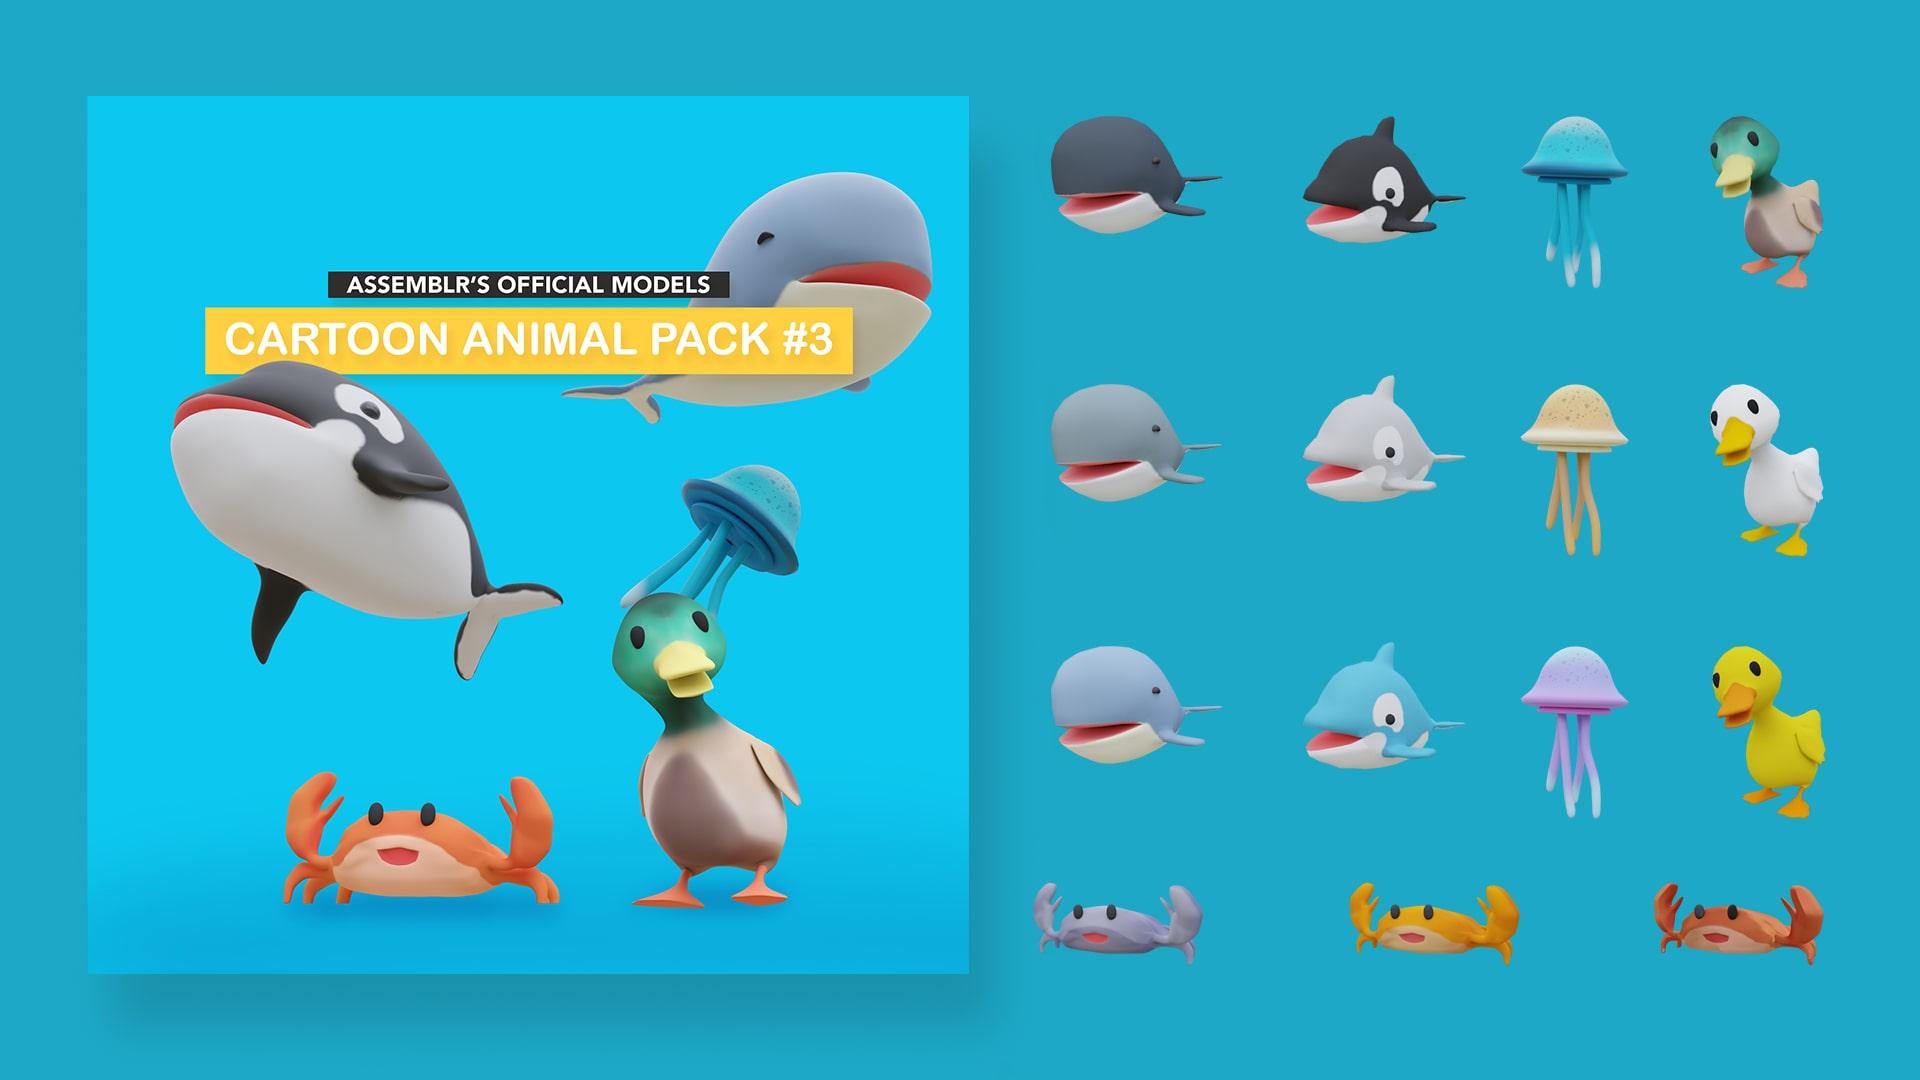 Cartoon animal pack #3